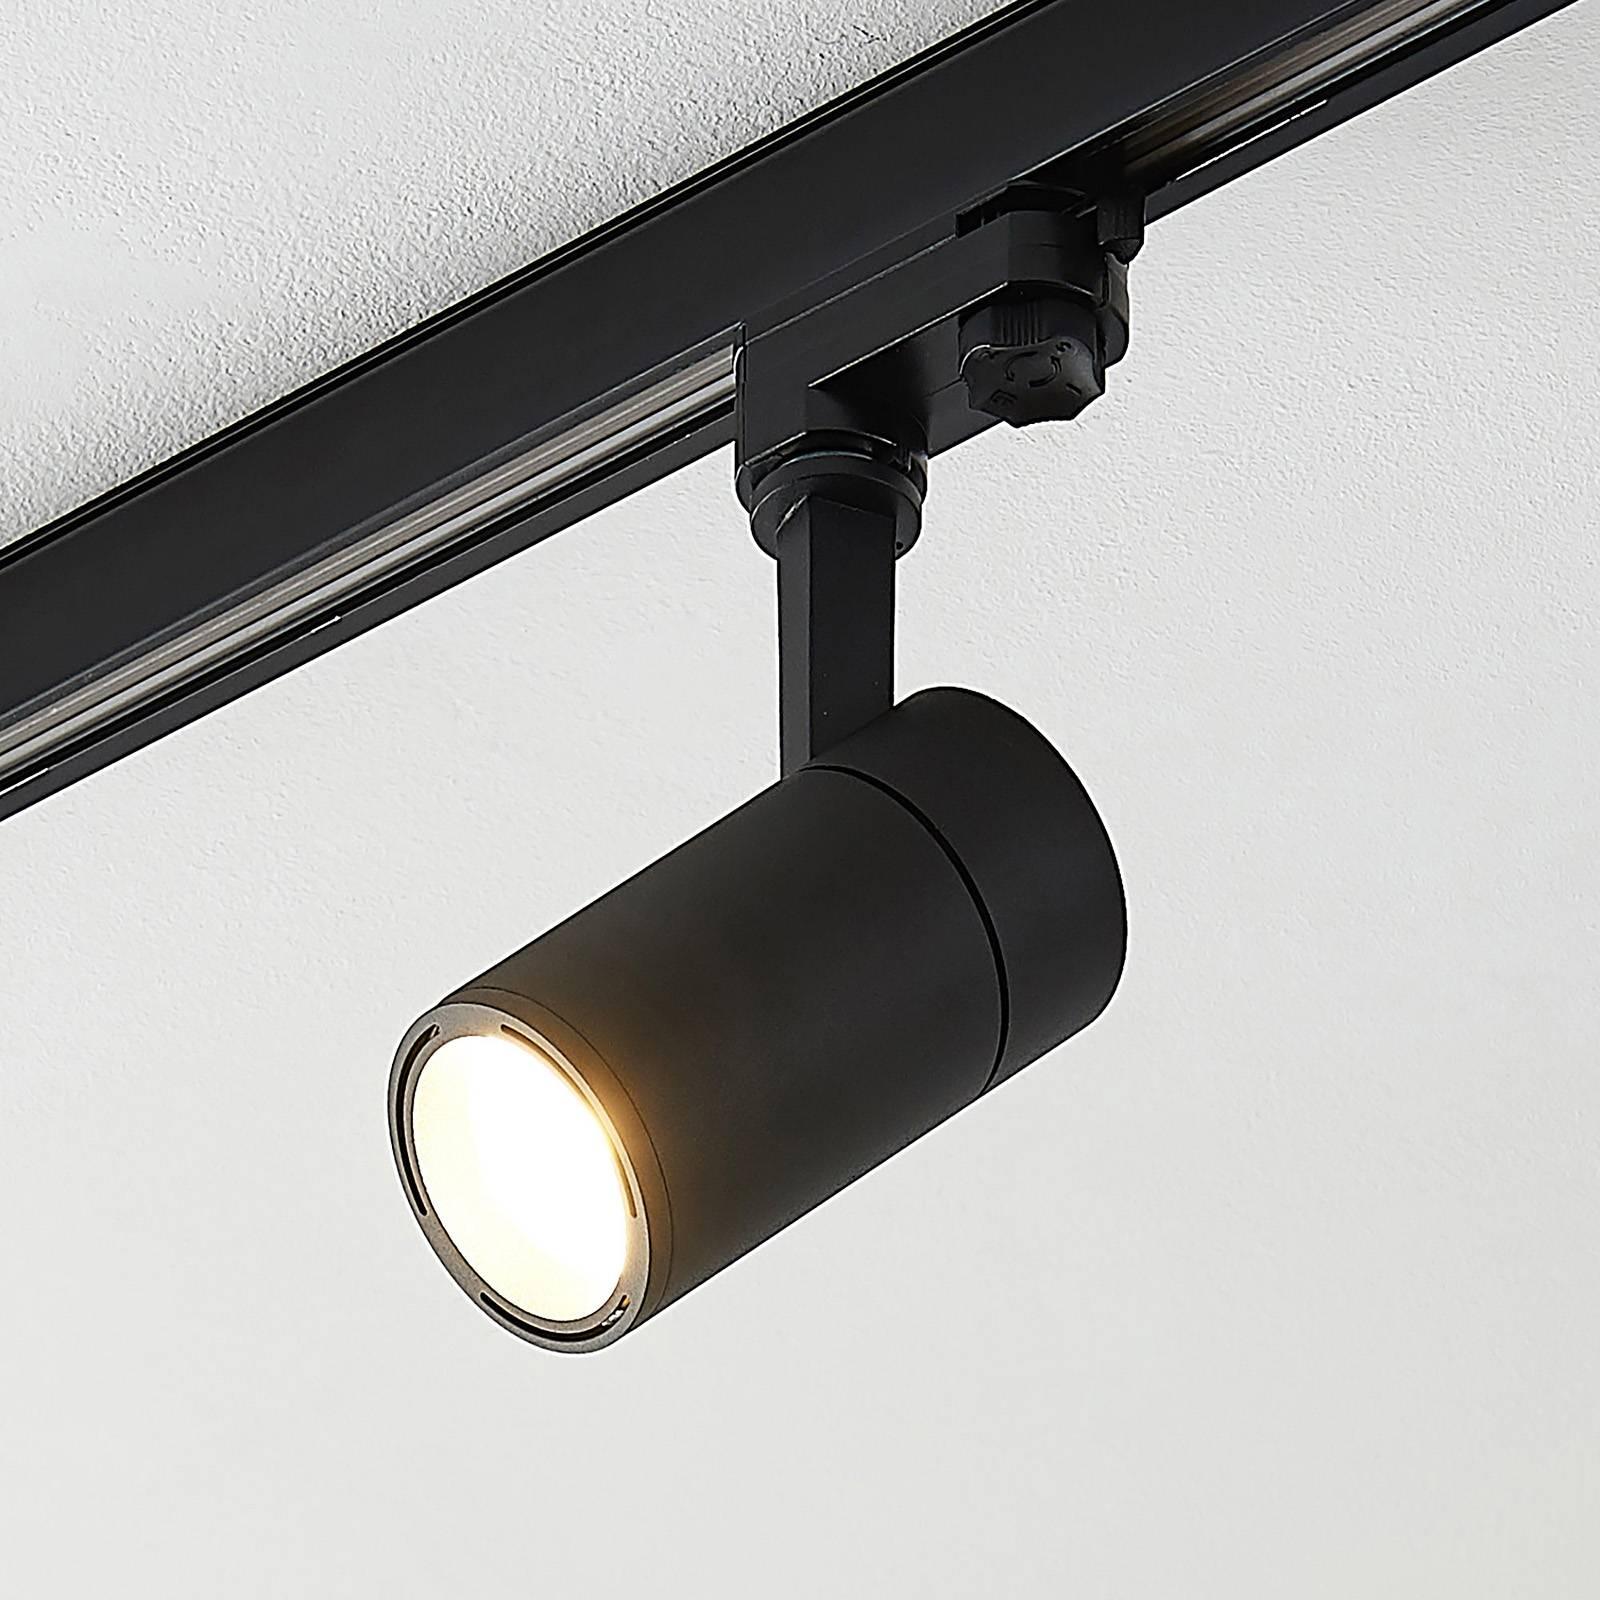 Arcchio Cady LED-kiskovalaisin, musta 36° 12 W